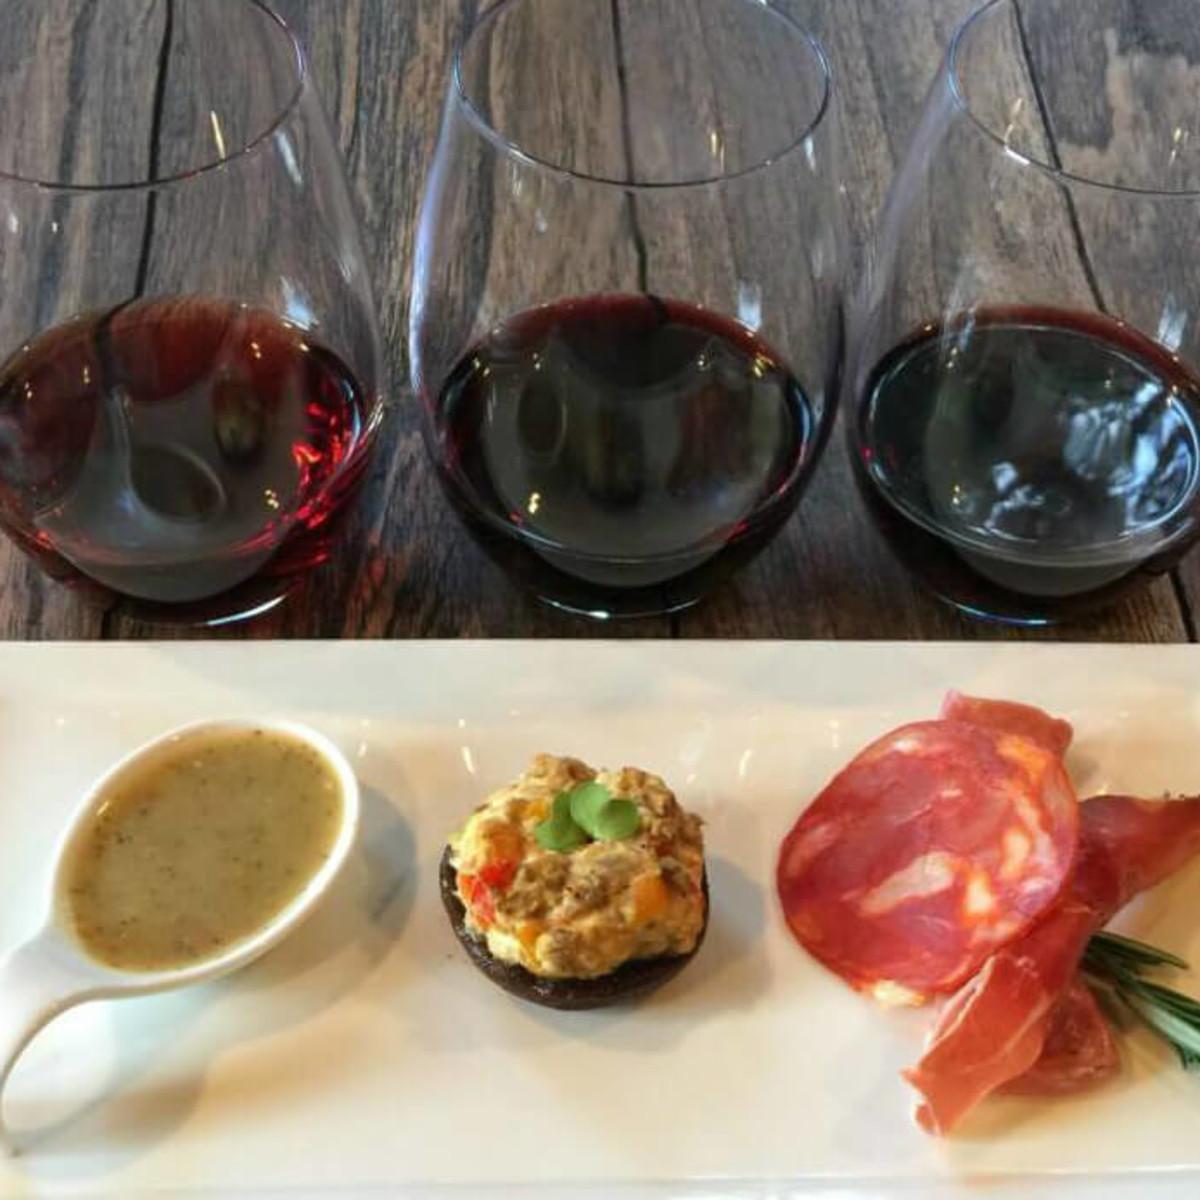 House Wine Austin bar wine glass food pairings plate 2015